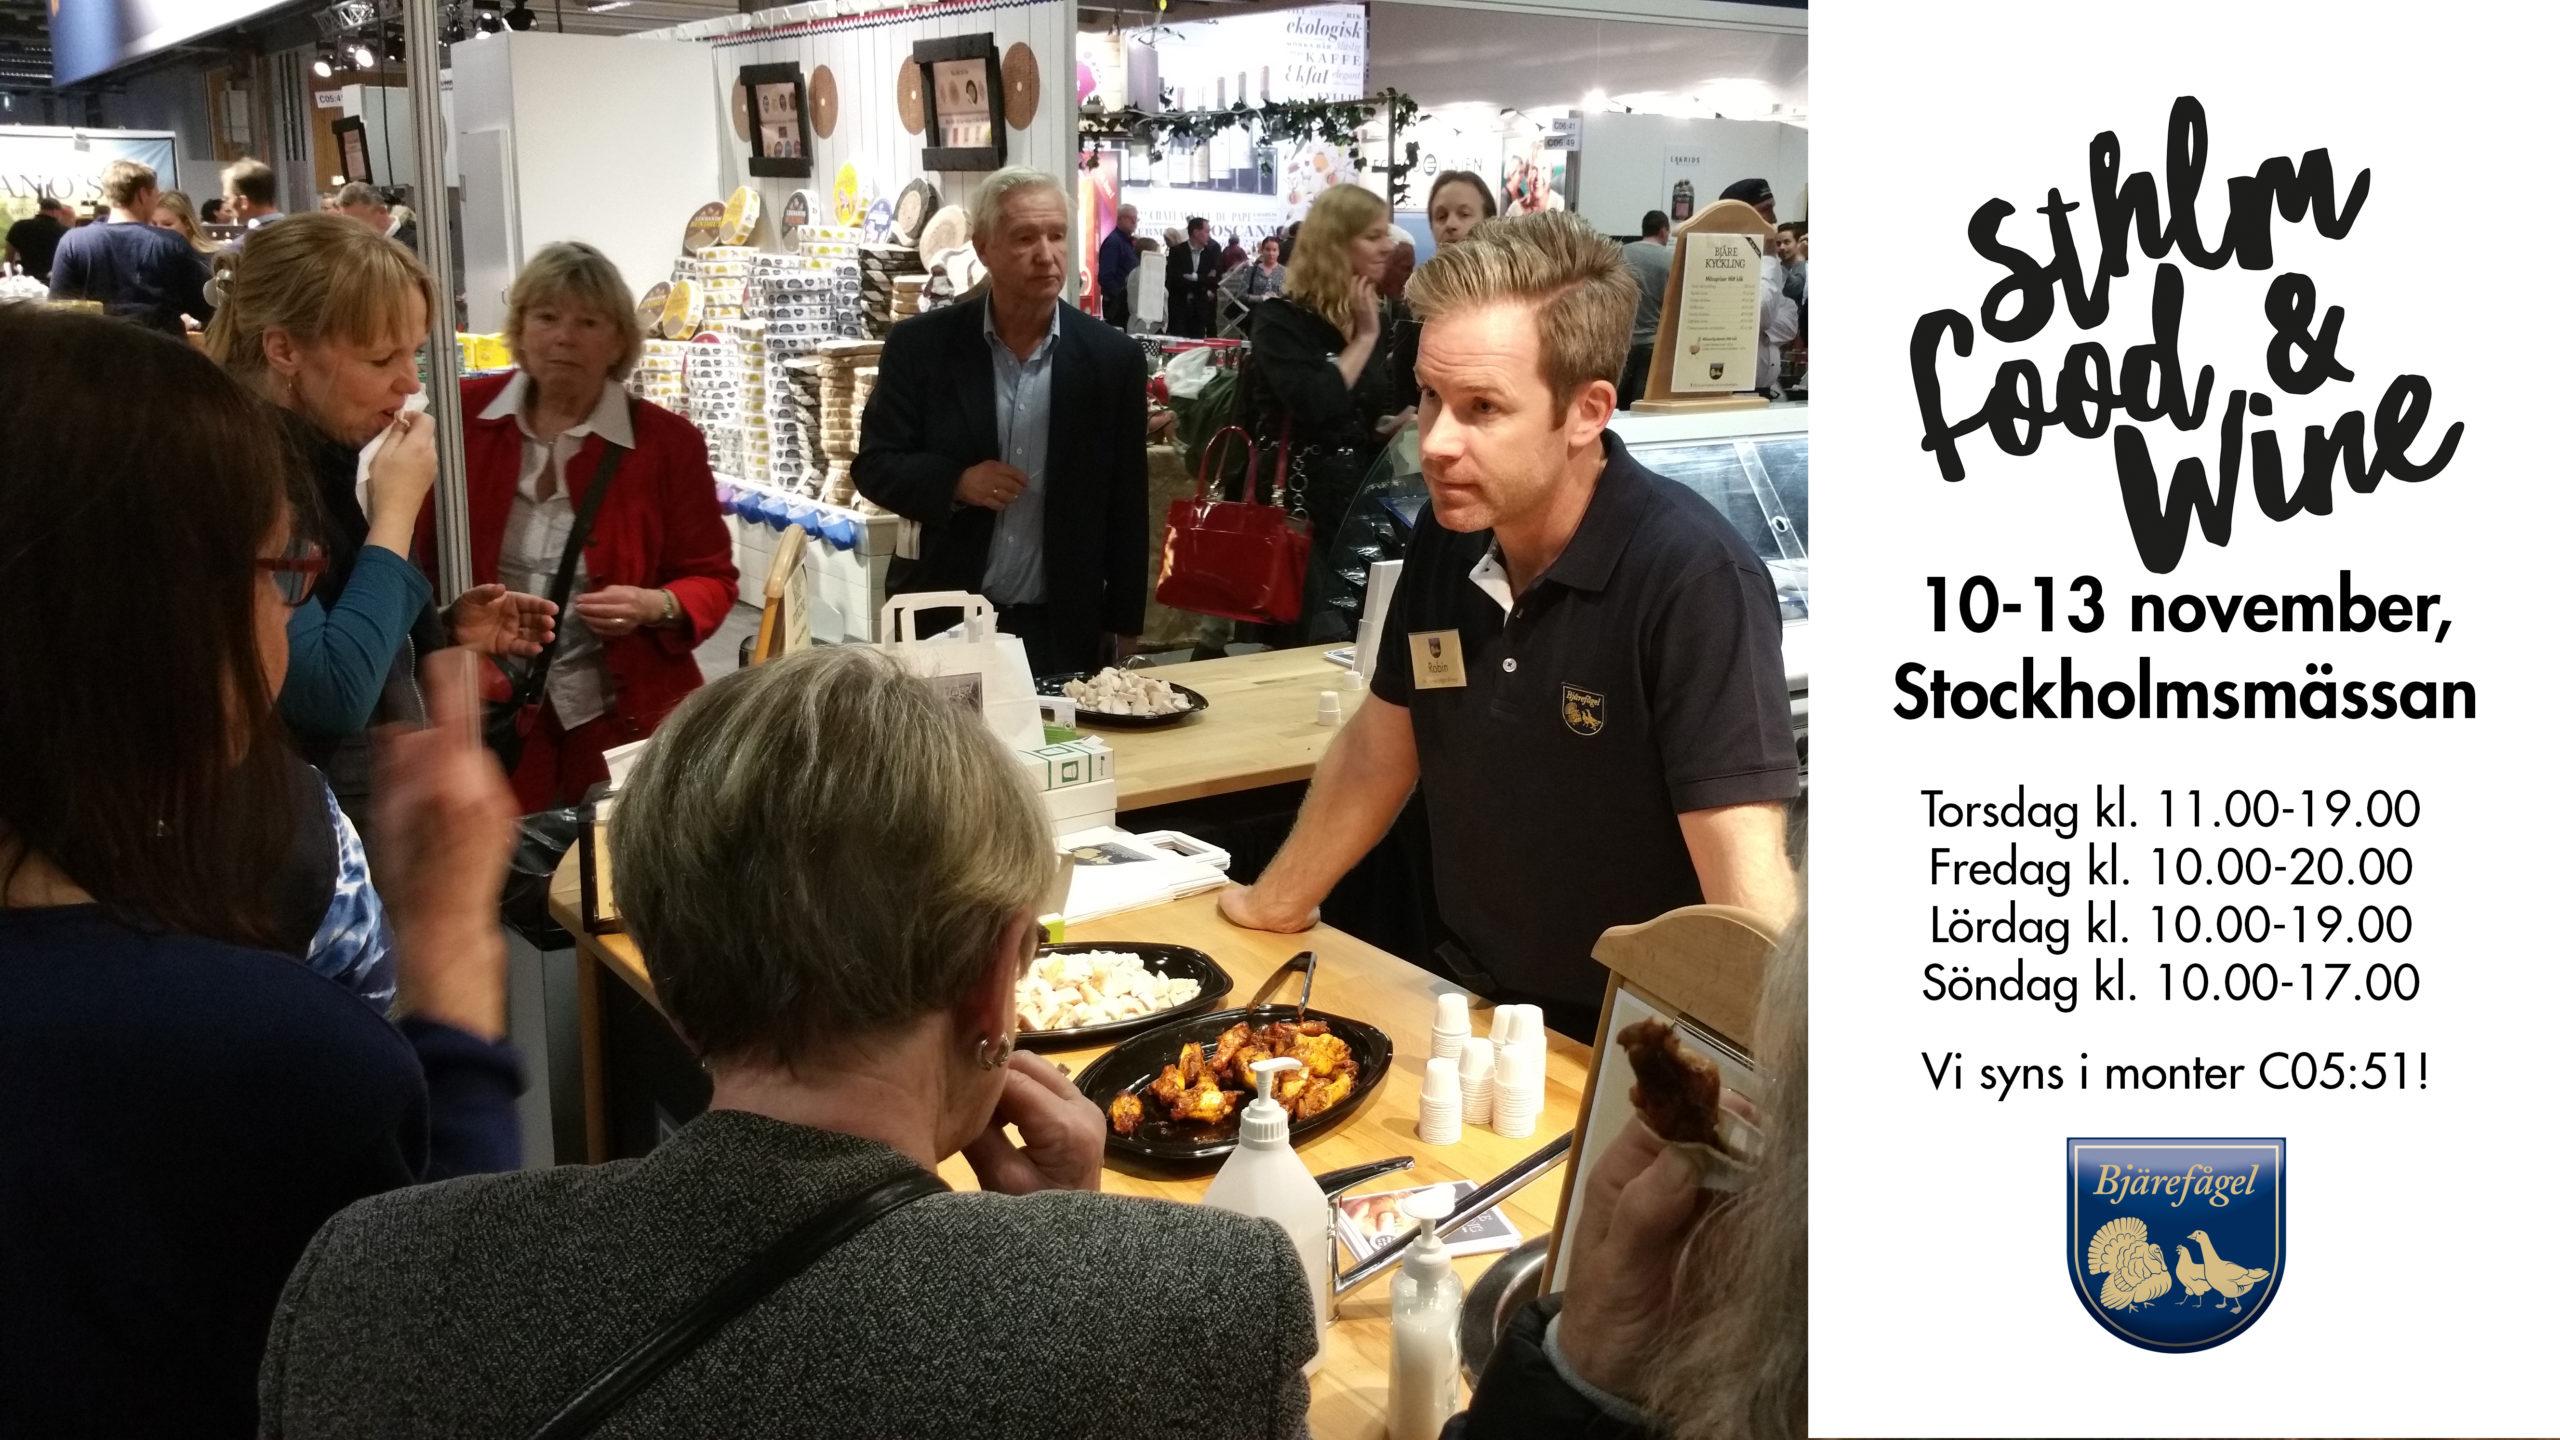 Sthlm Food & Wine, Stockholm, 10-13 november